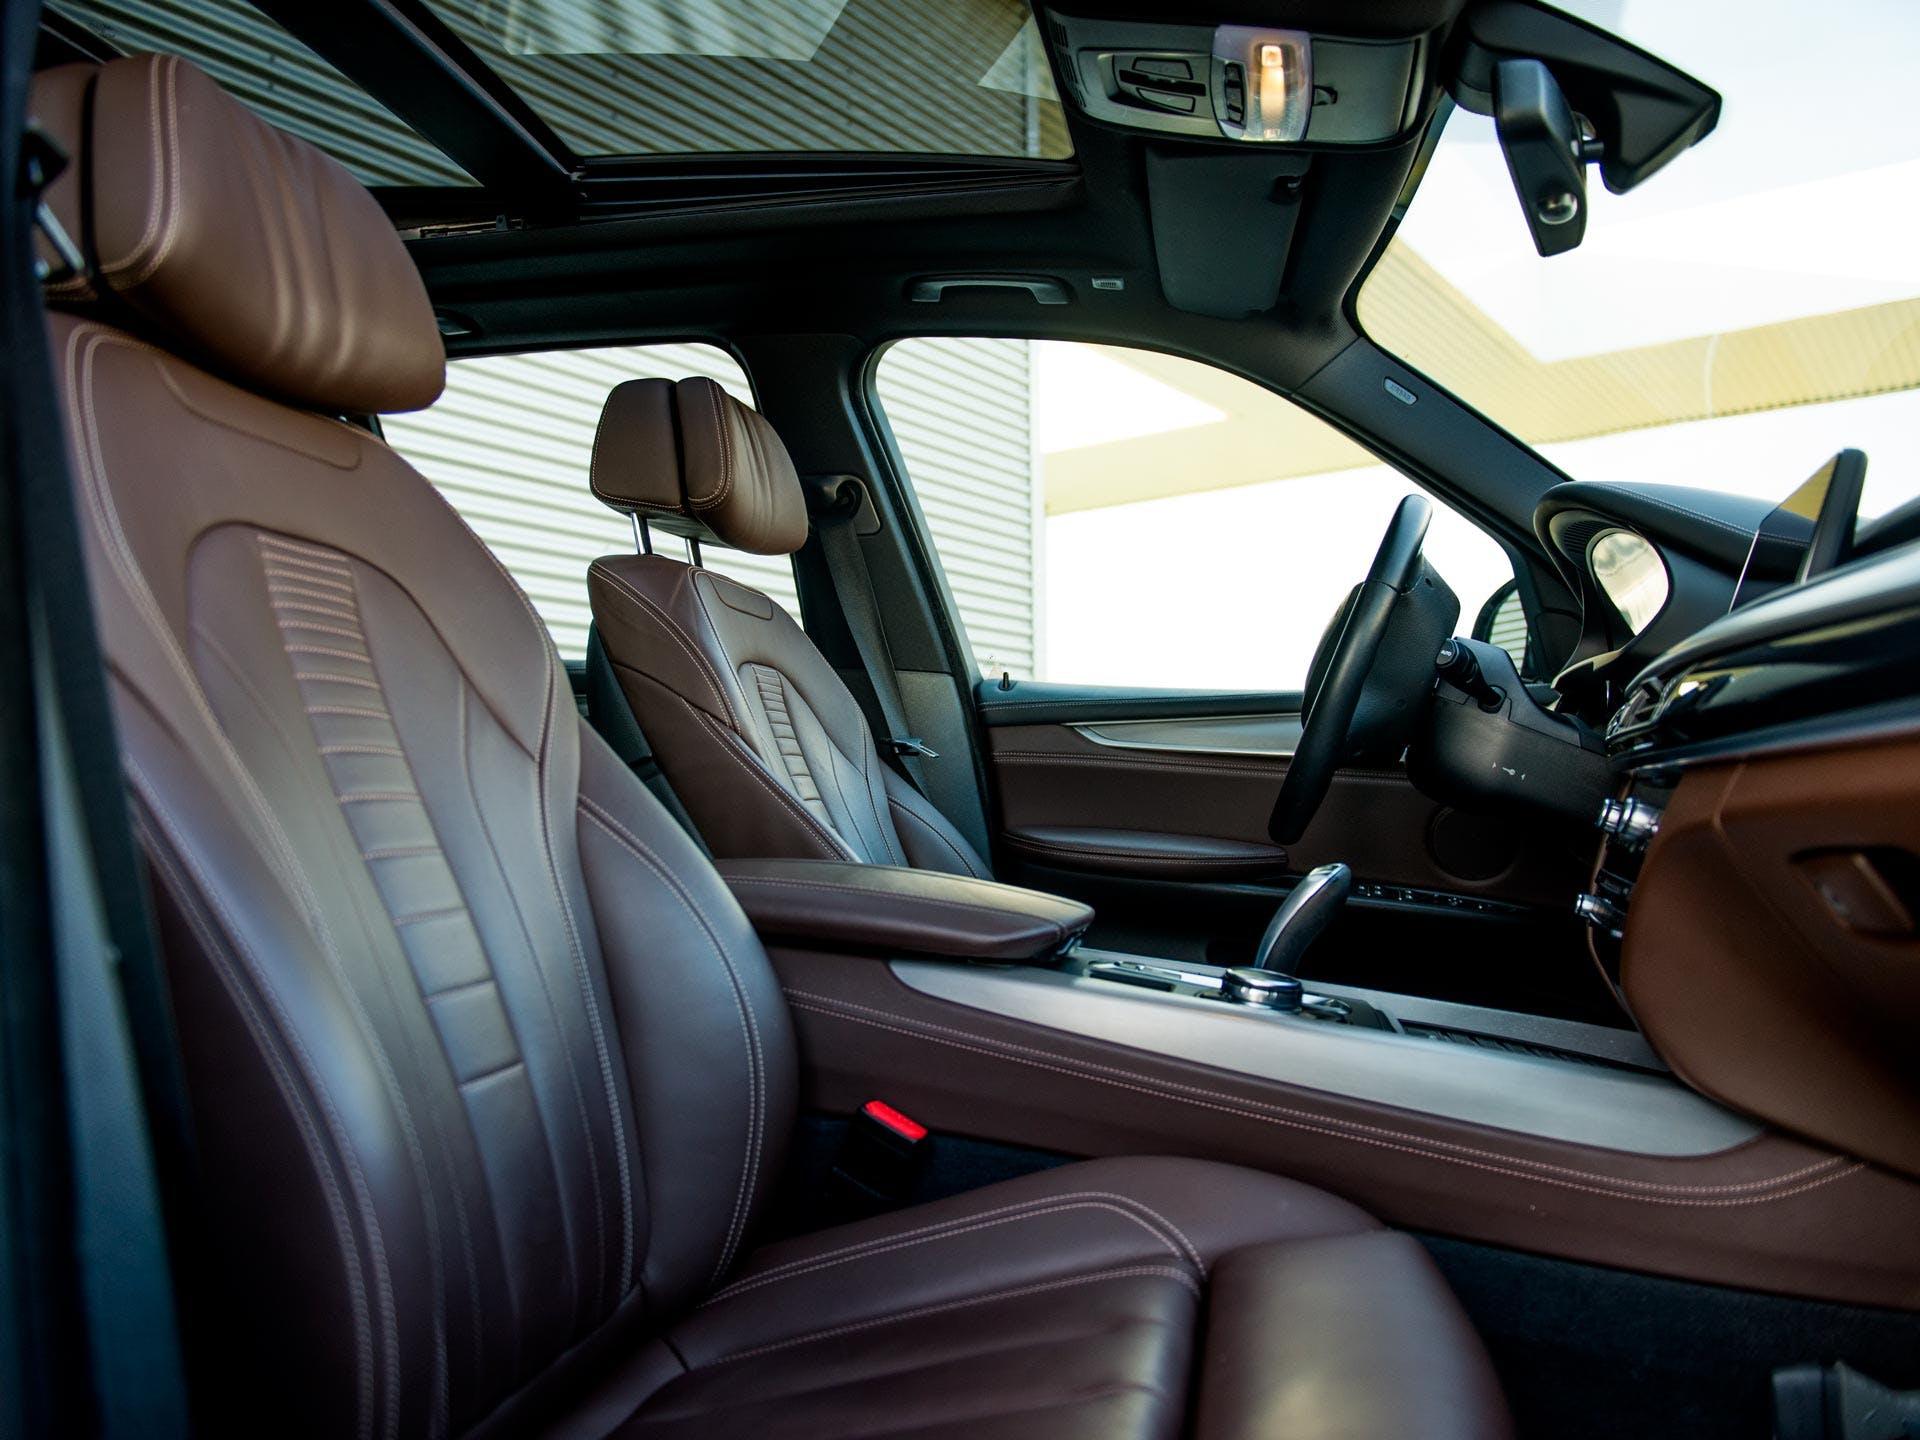 Tweedehands BMW X5 xDrive40e 2015 occasion